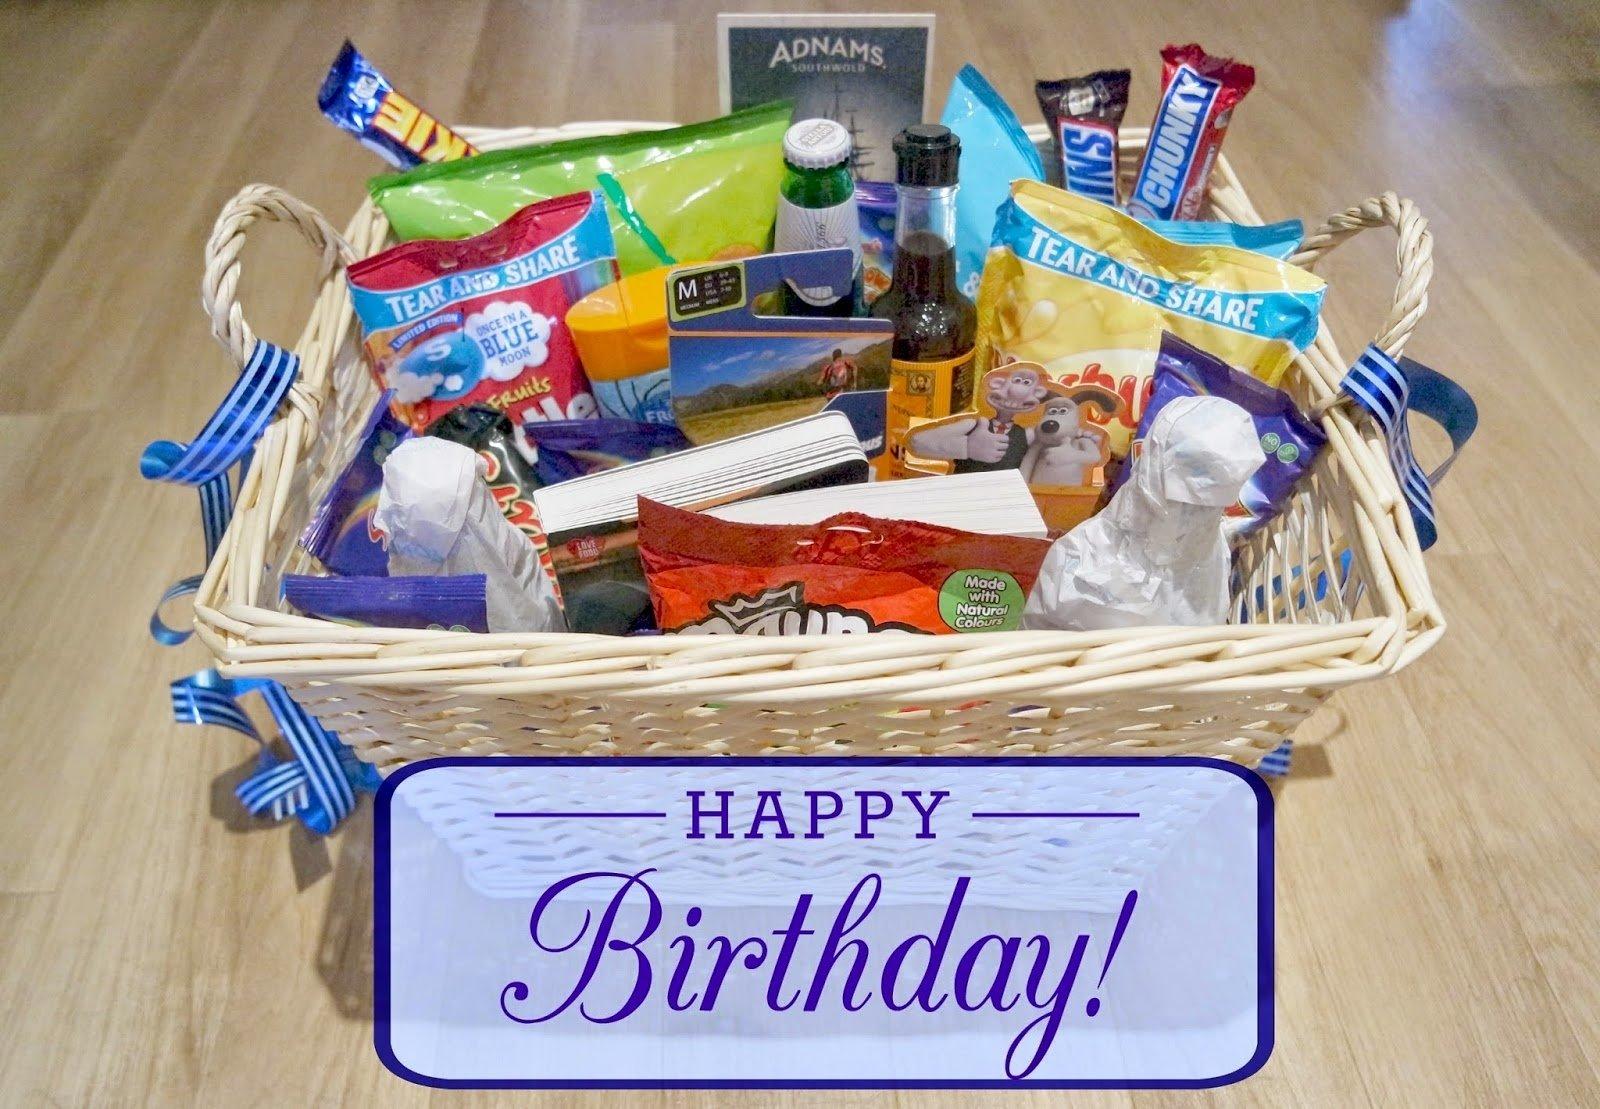 10 Trendy 50Th Birthday Ideas For Dad uptown peach my dads 50th birthday hamper mens gift ideas 26 2021